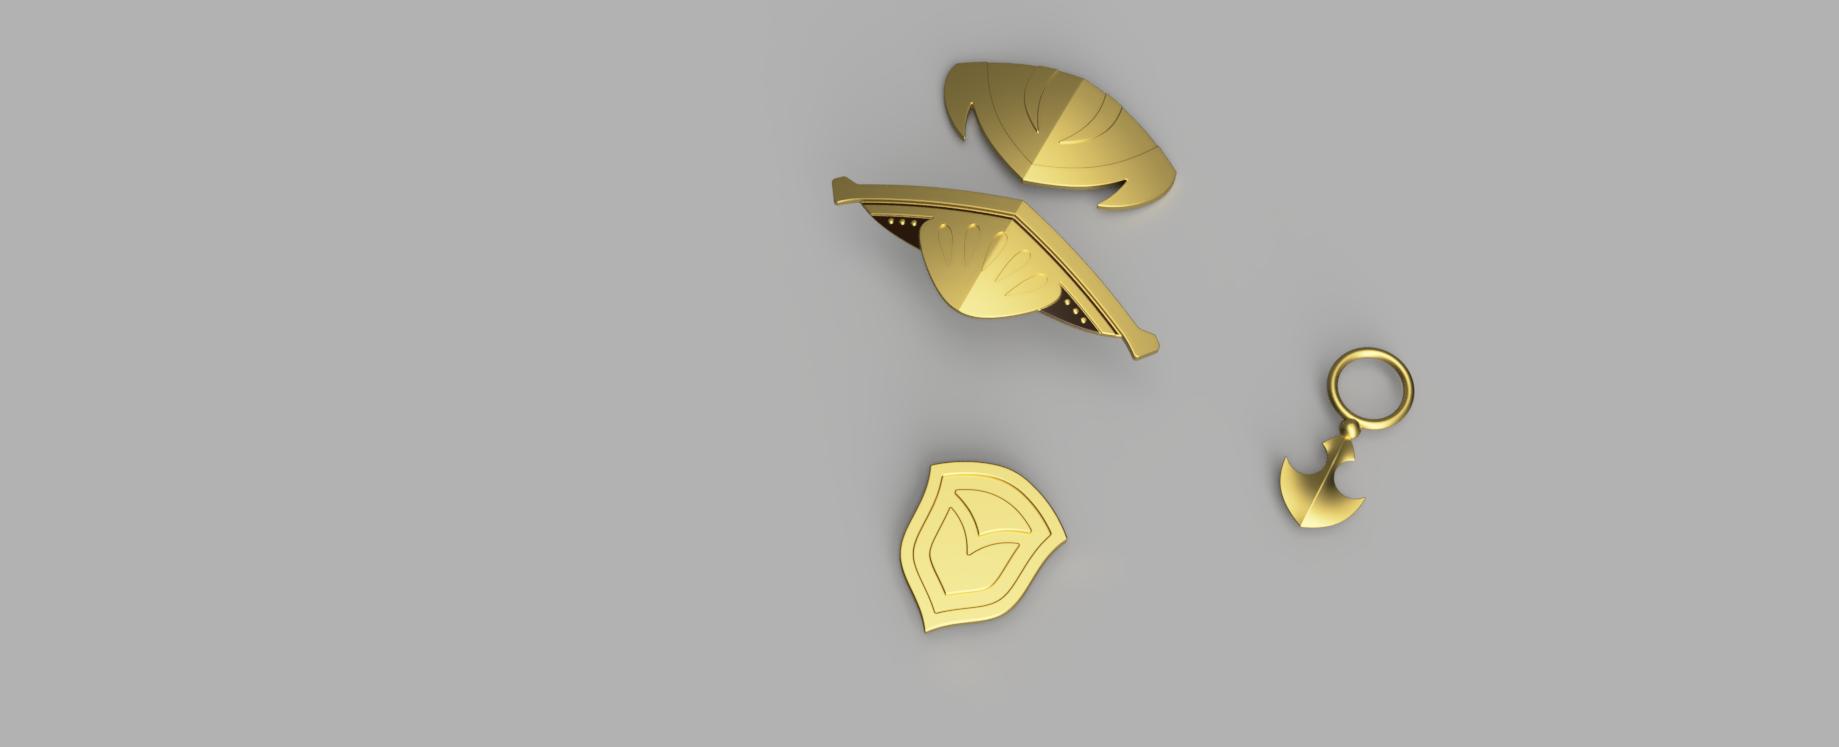 THARJA's Christmas Armor [3D Print Files] from Dangerous Ladies' Cosplay  Kits